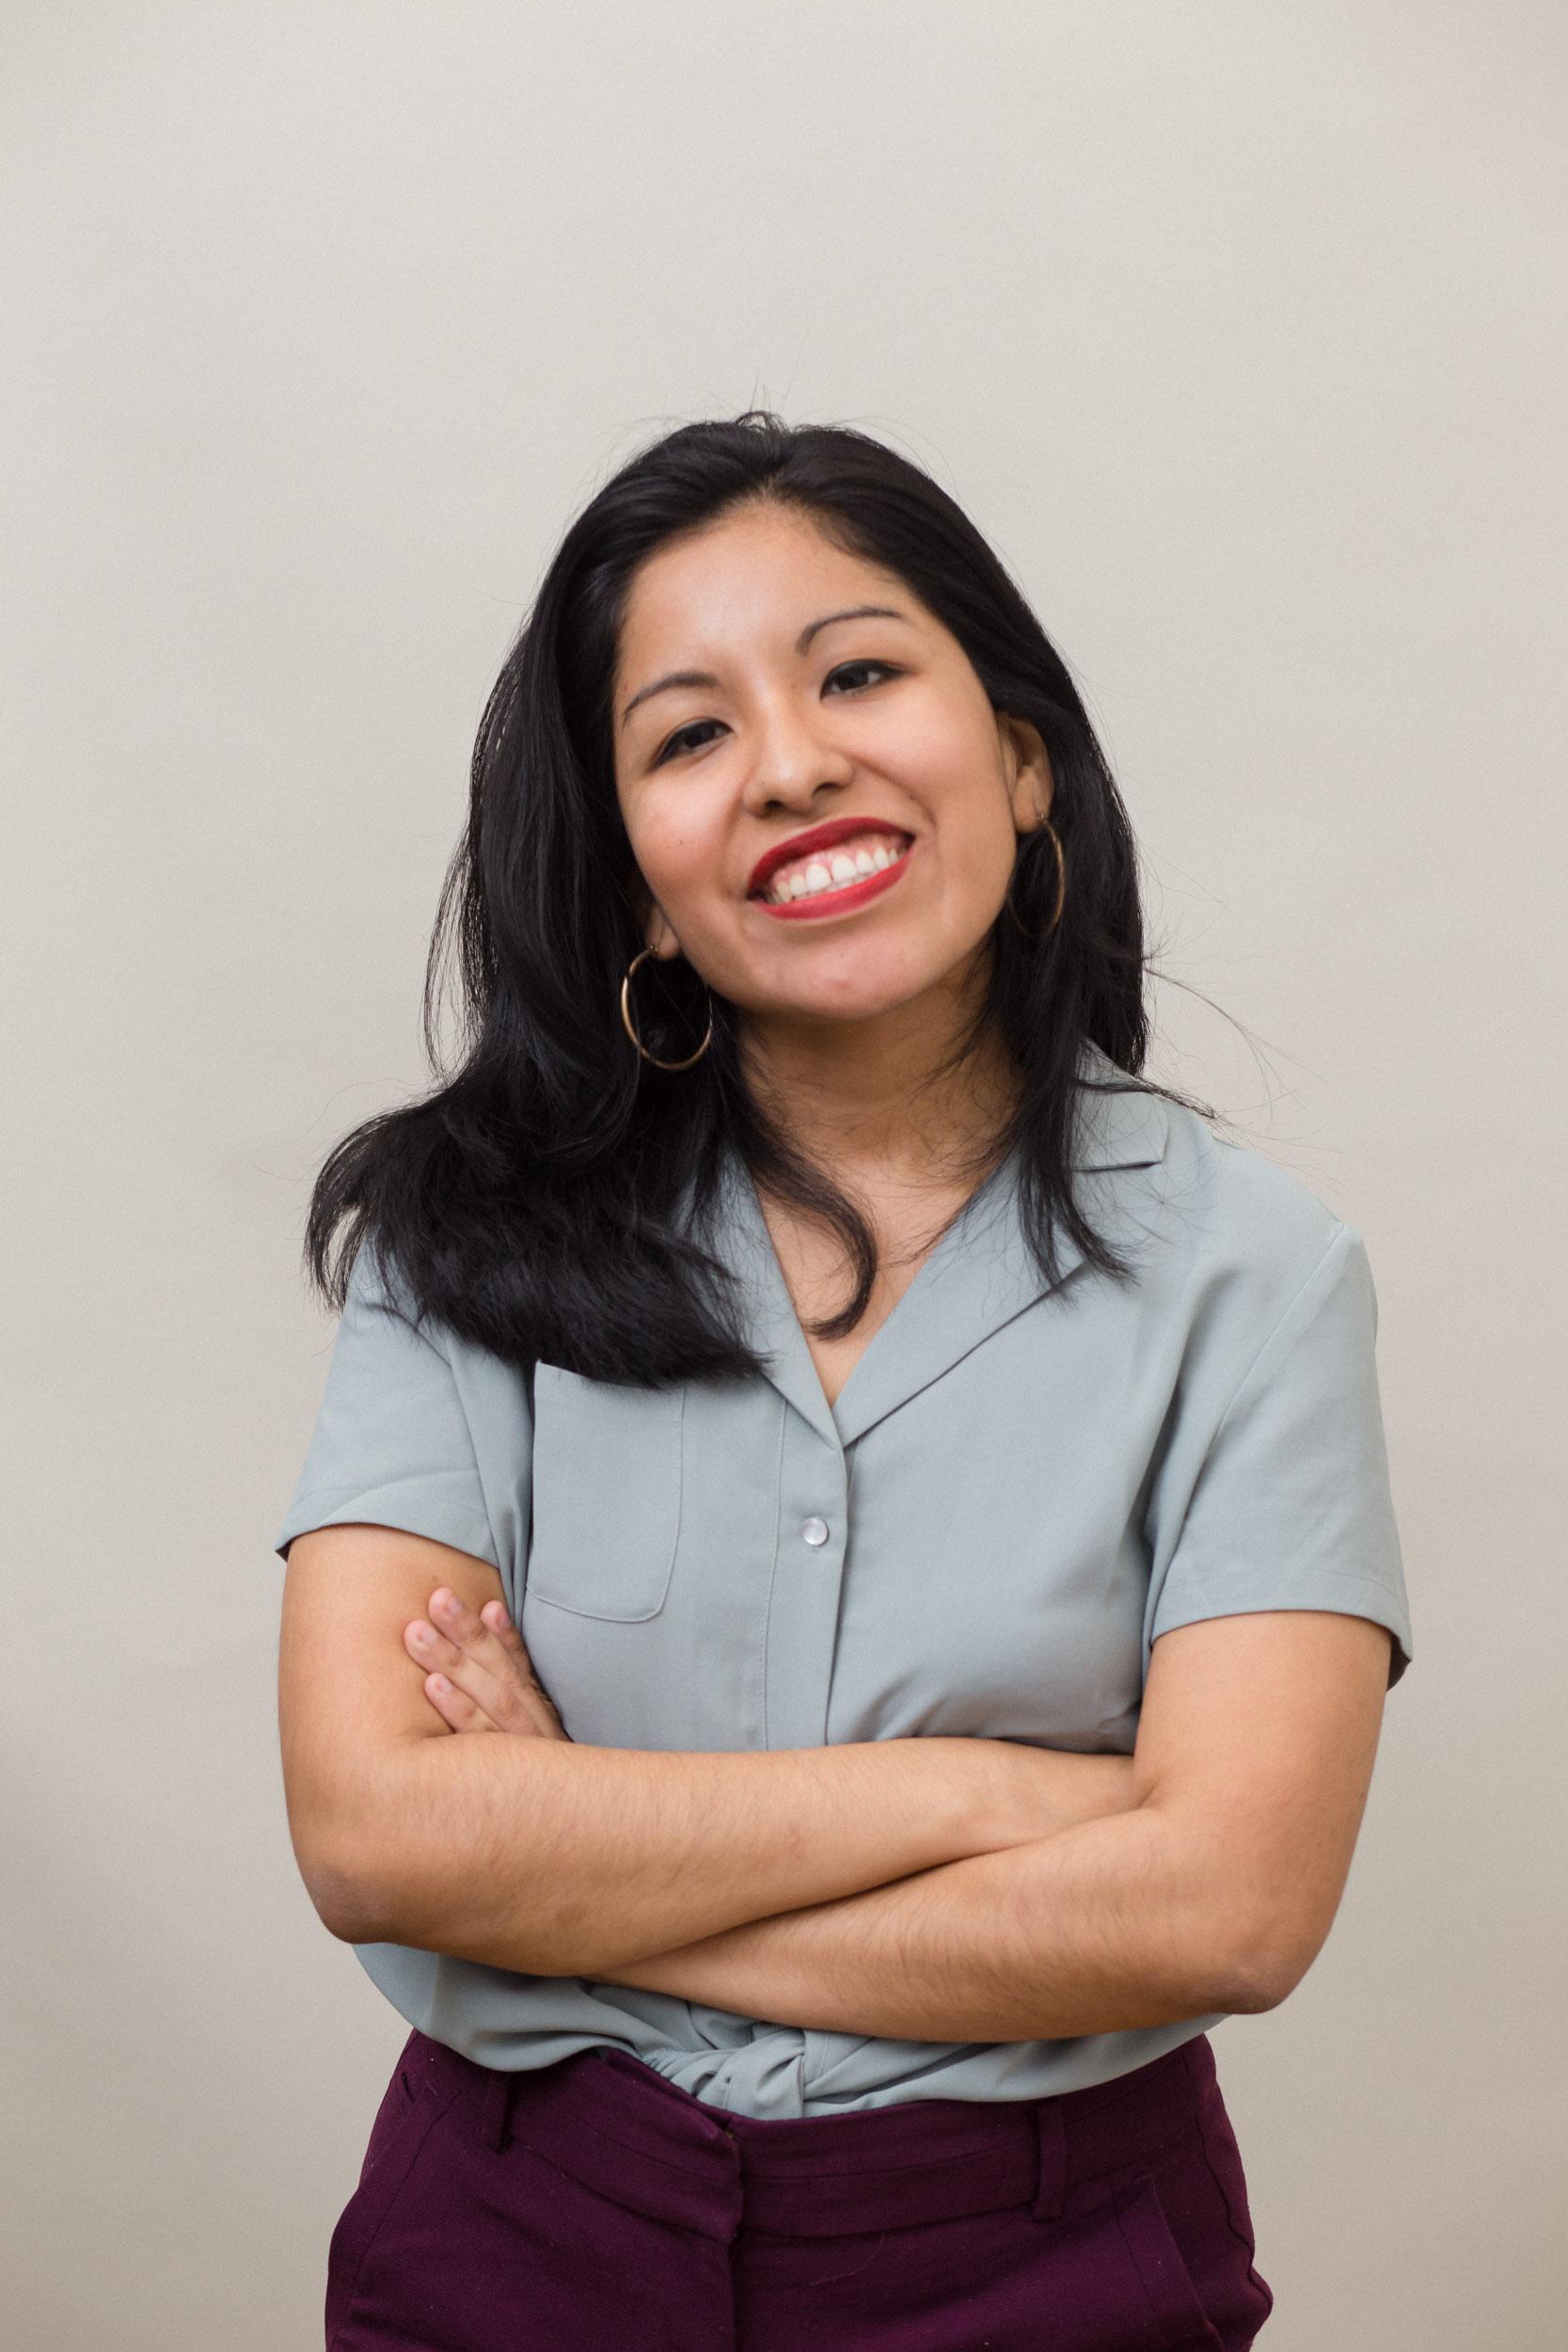 Yvette-Ramirez